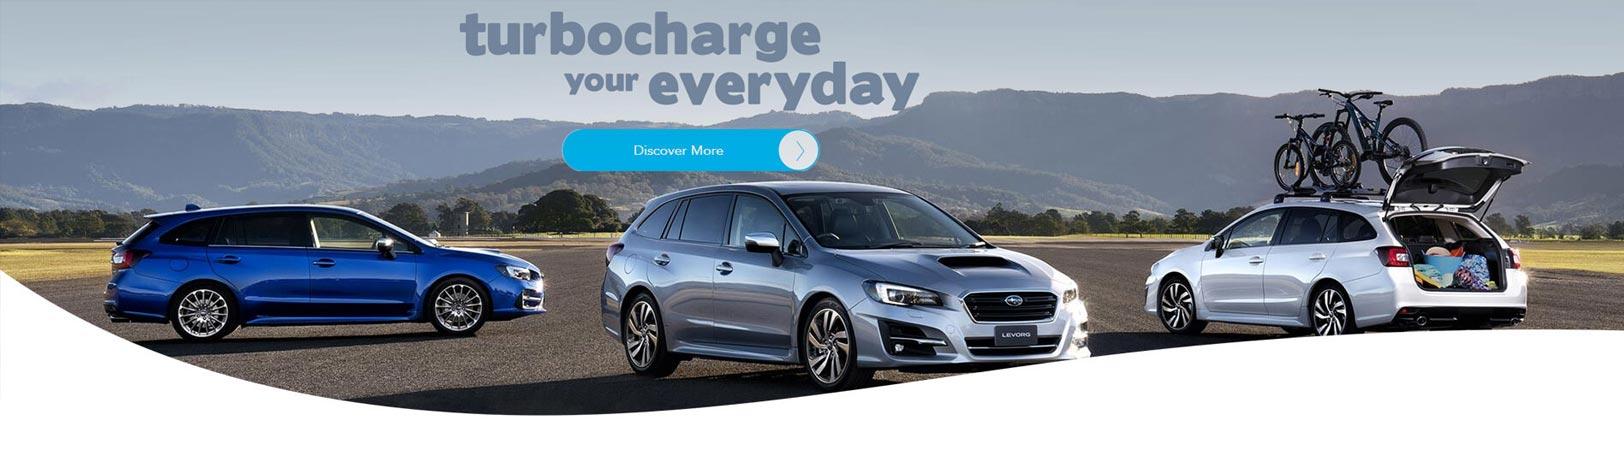 Turbocharge your everyday